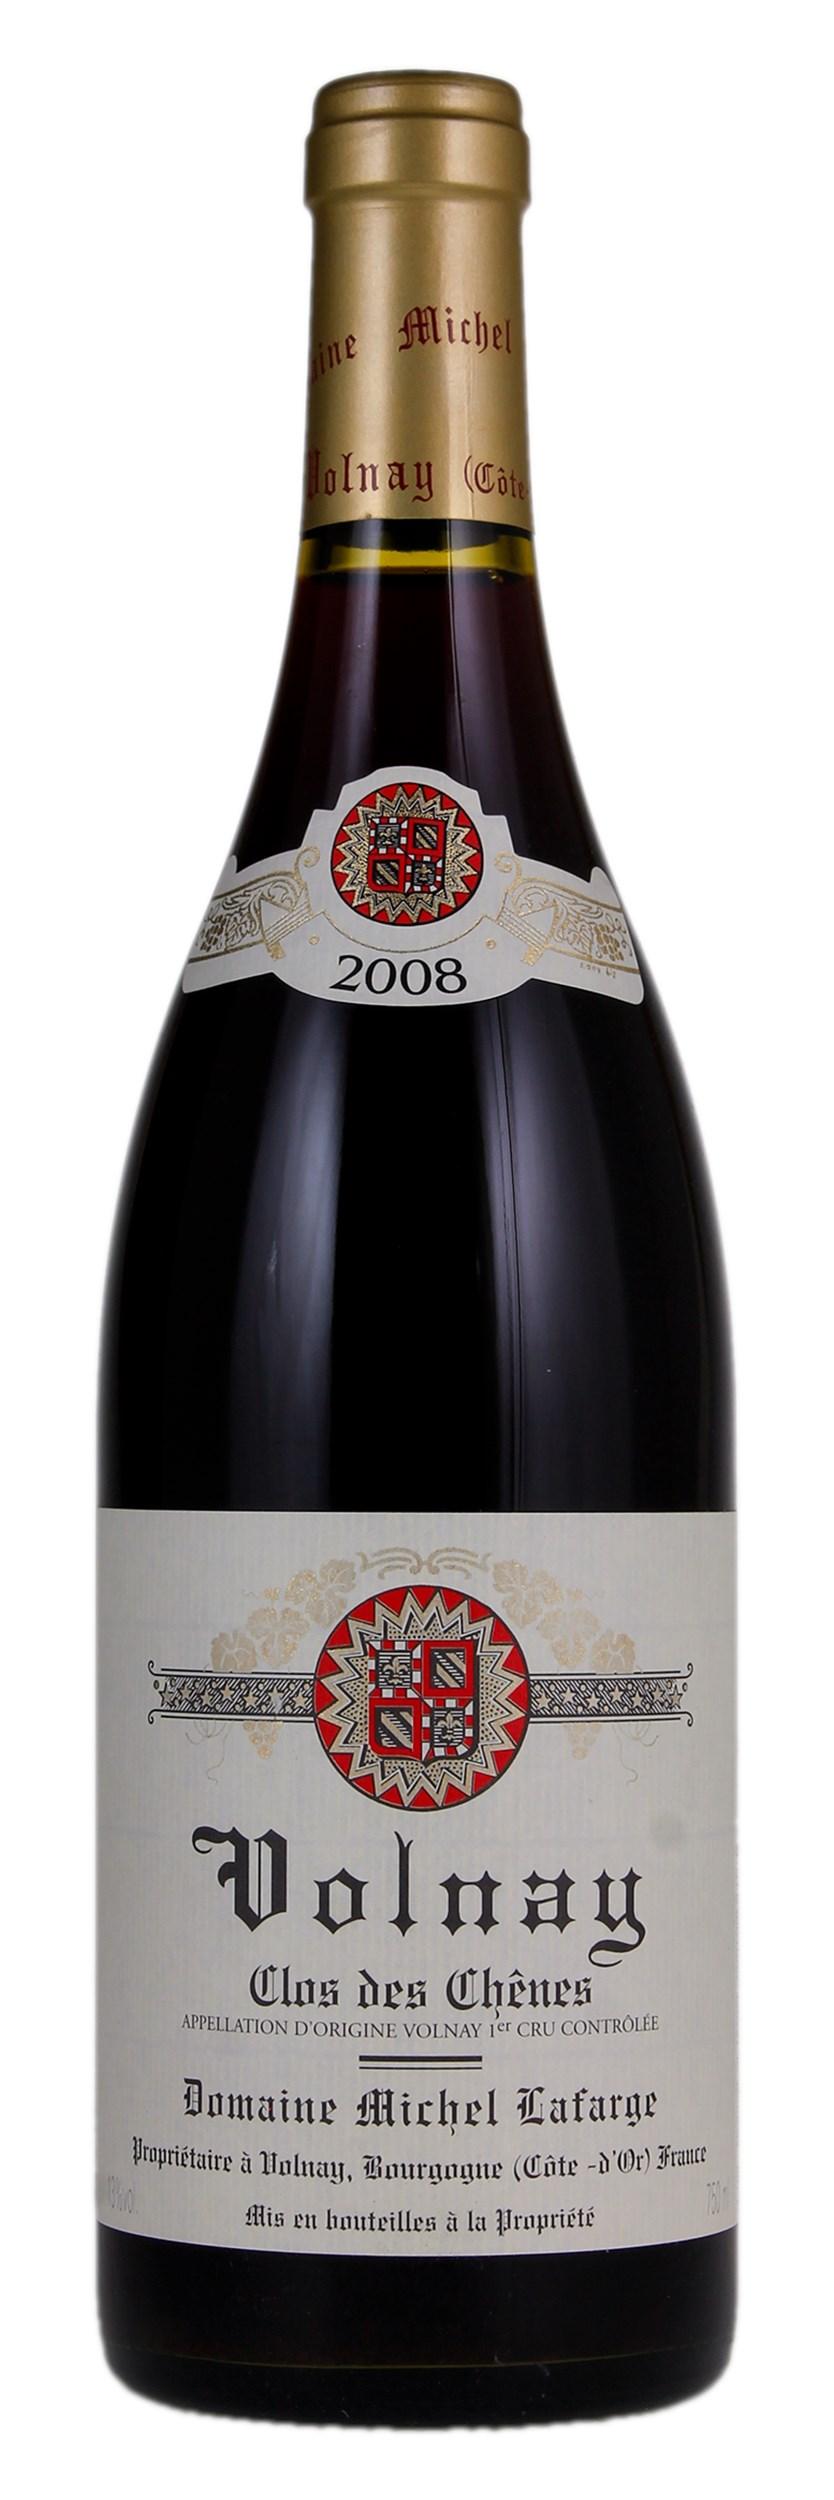 2008 Michel Lafarge Red Wine Pinot Noir 1er Premier Cru Winebid